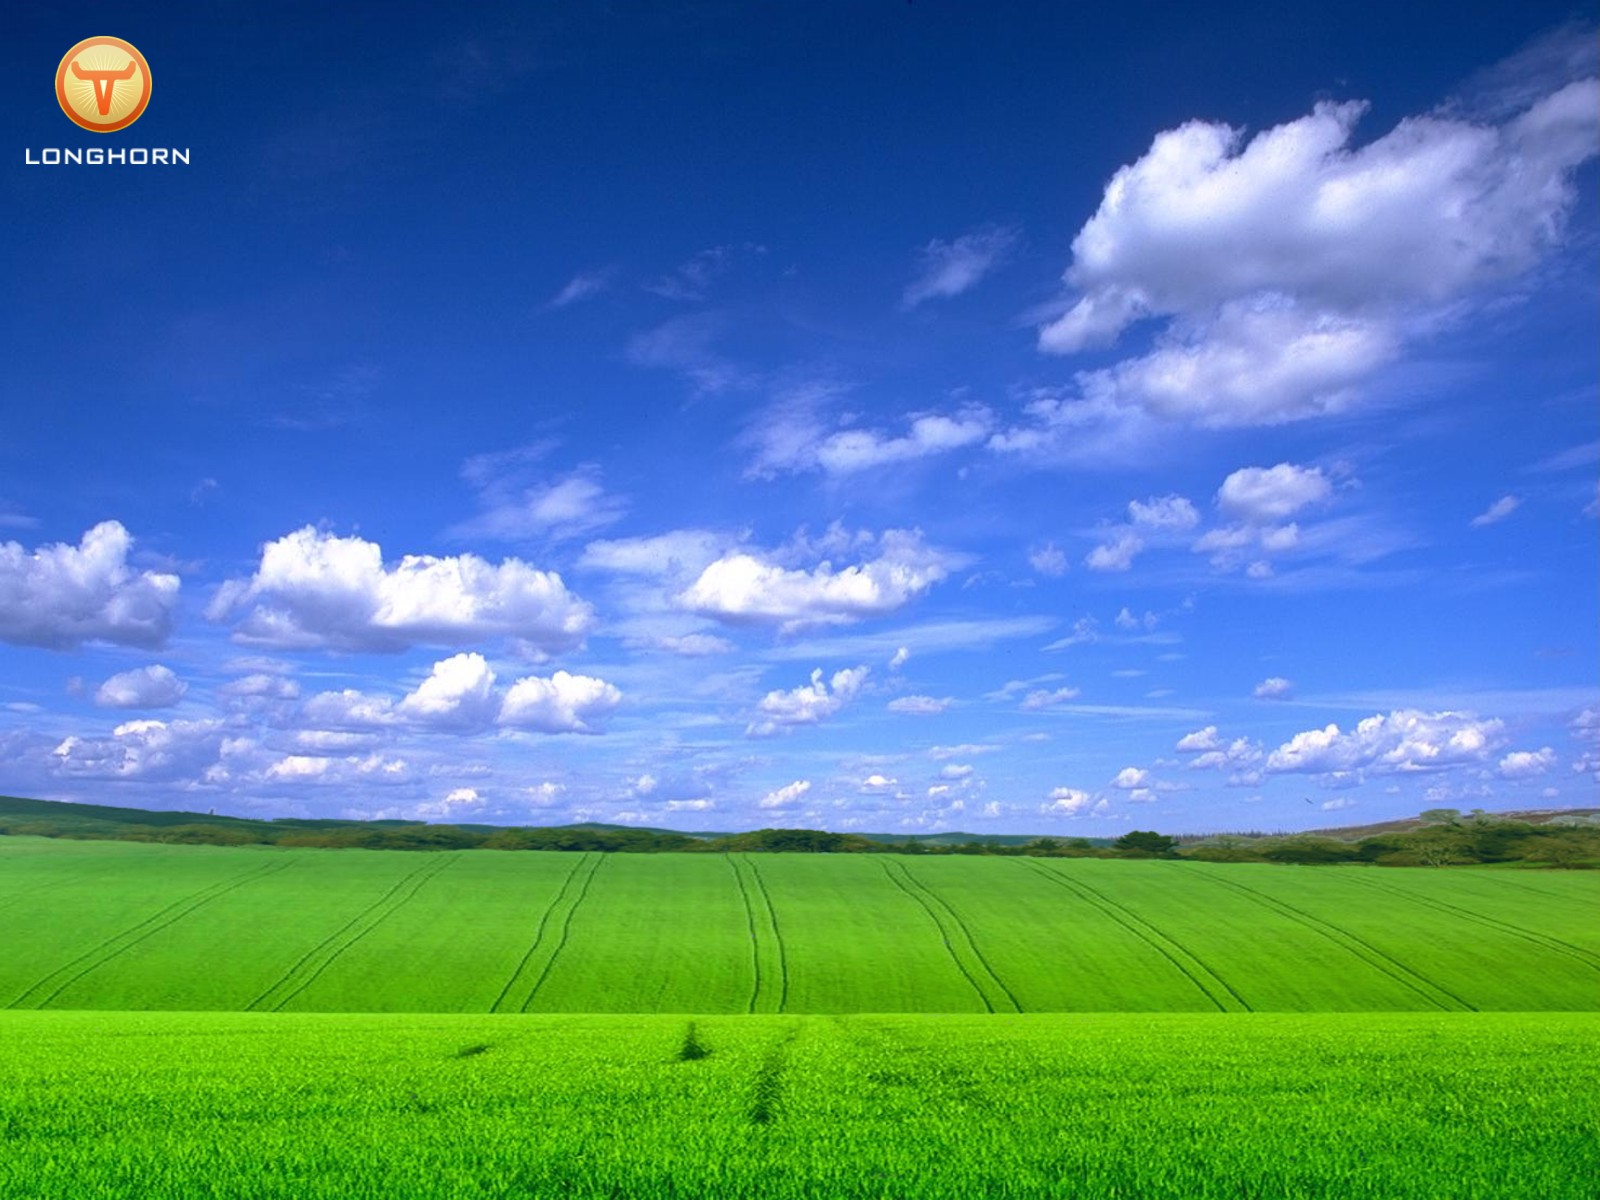 http://3.bp.blogspot.com/_BgkzdqiEW7M/TG6uMelxSkI/AAAAAAAABiU/g0rCiiMFl_Y/s1600/Longhorn_Grassy_With_Blue_Sky_2003.jpg